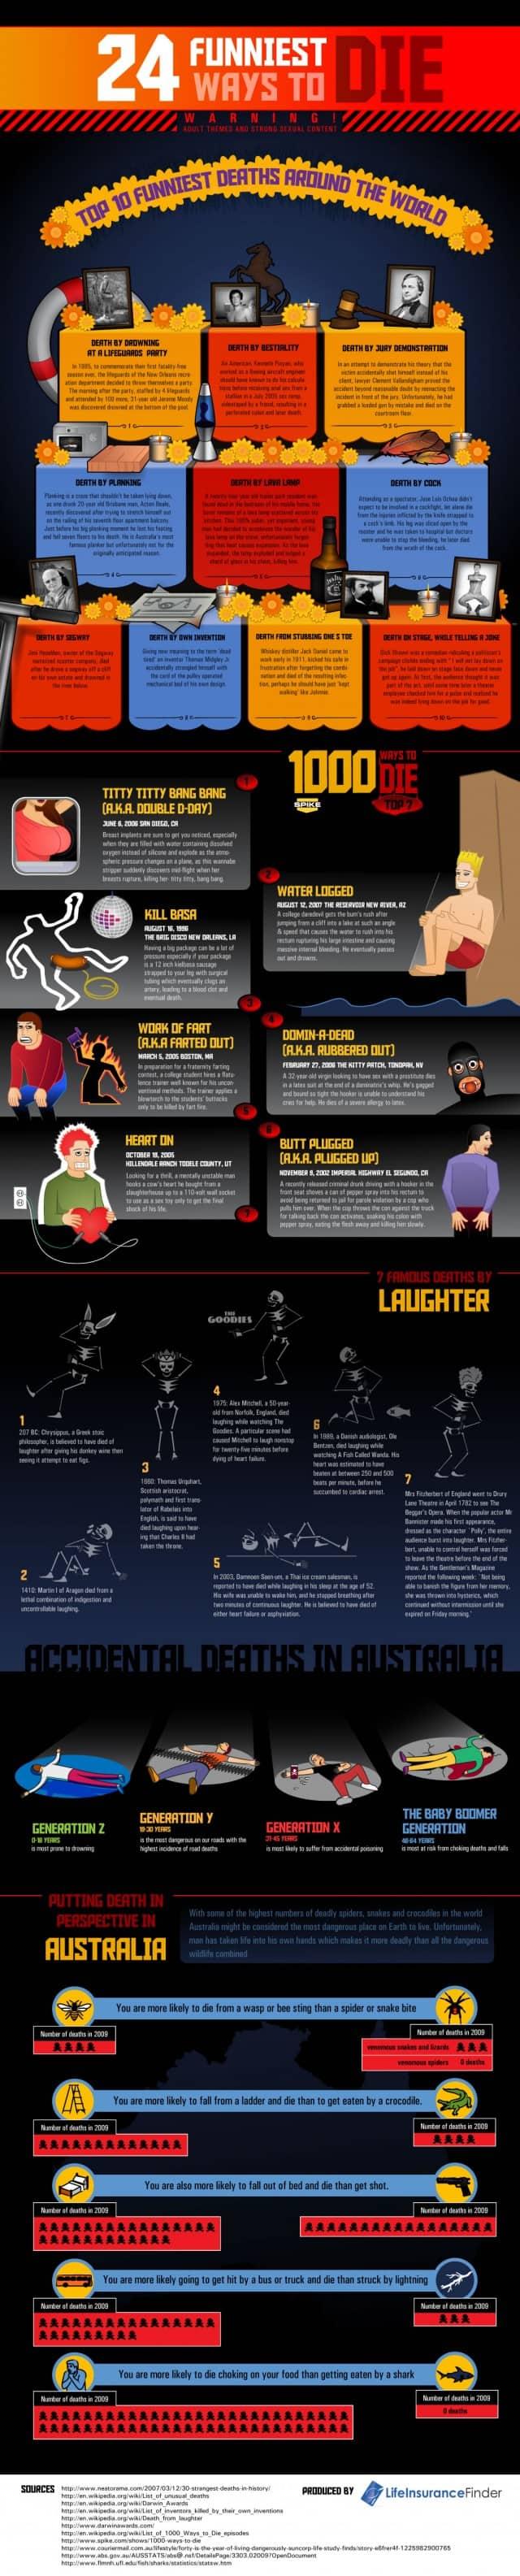 Funniest Deaths Infographic